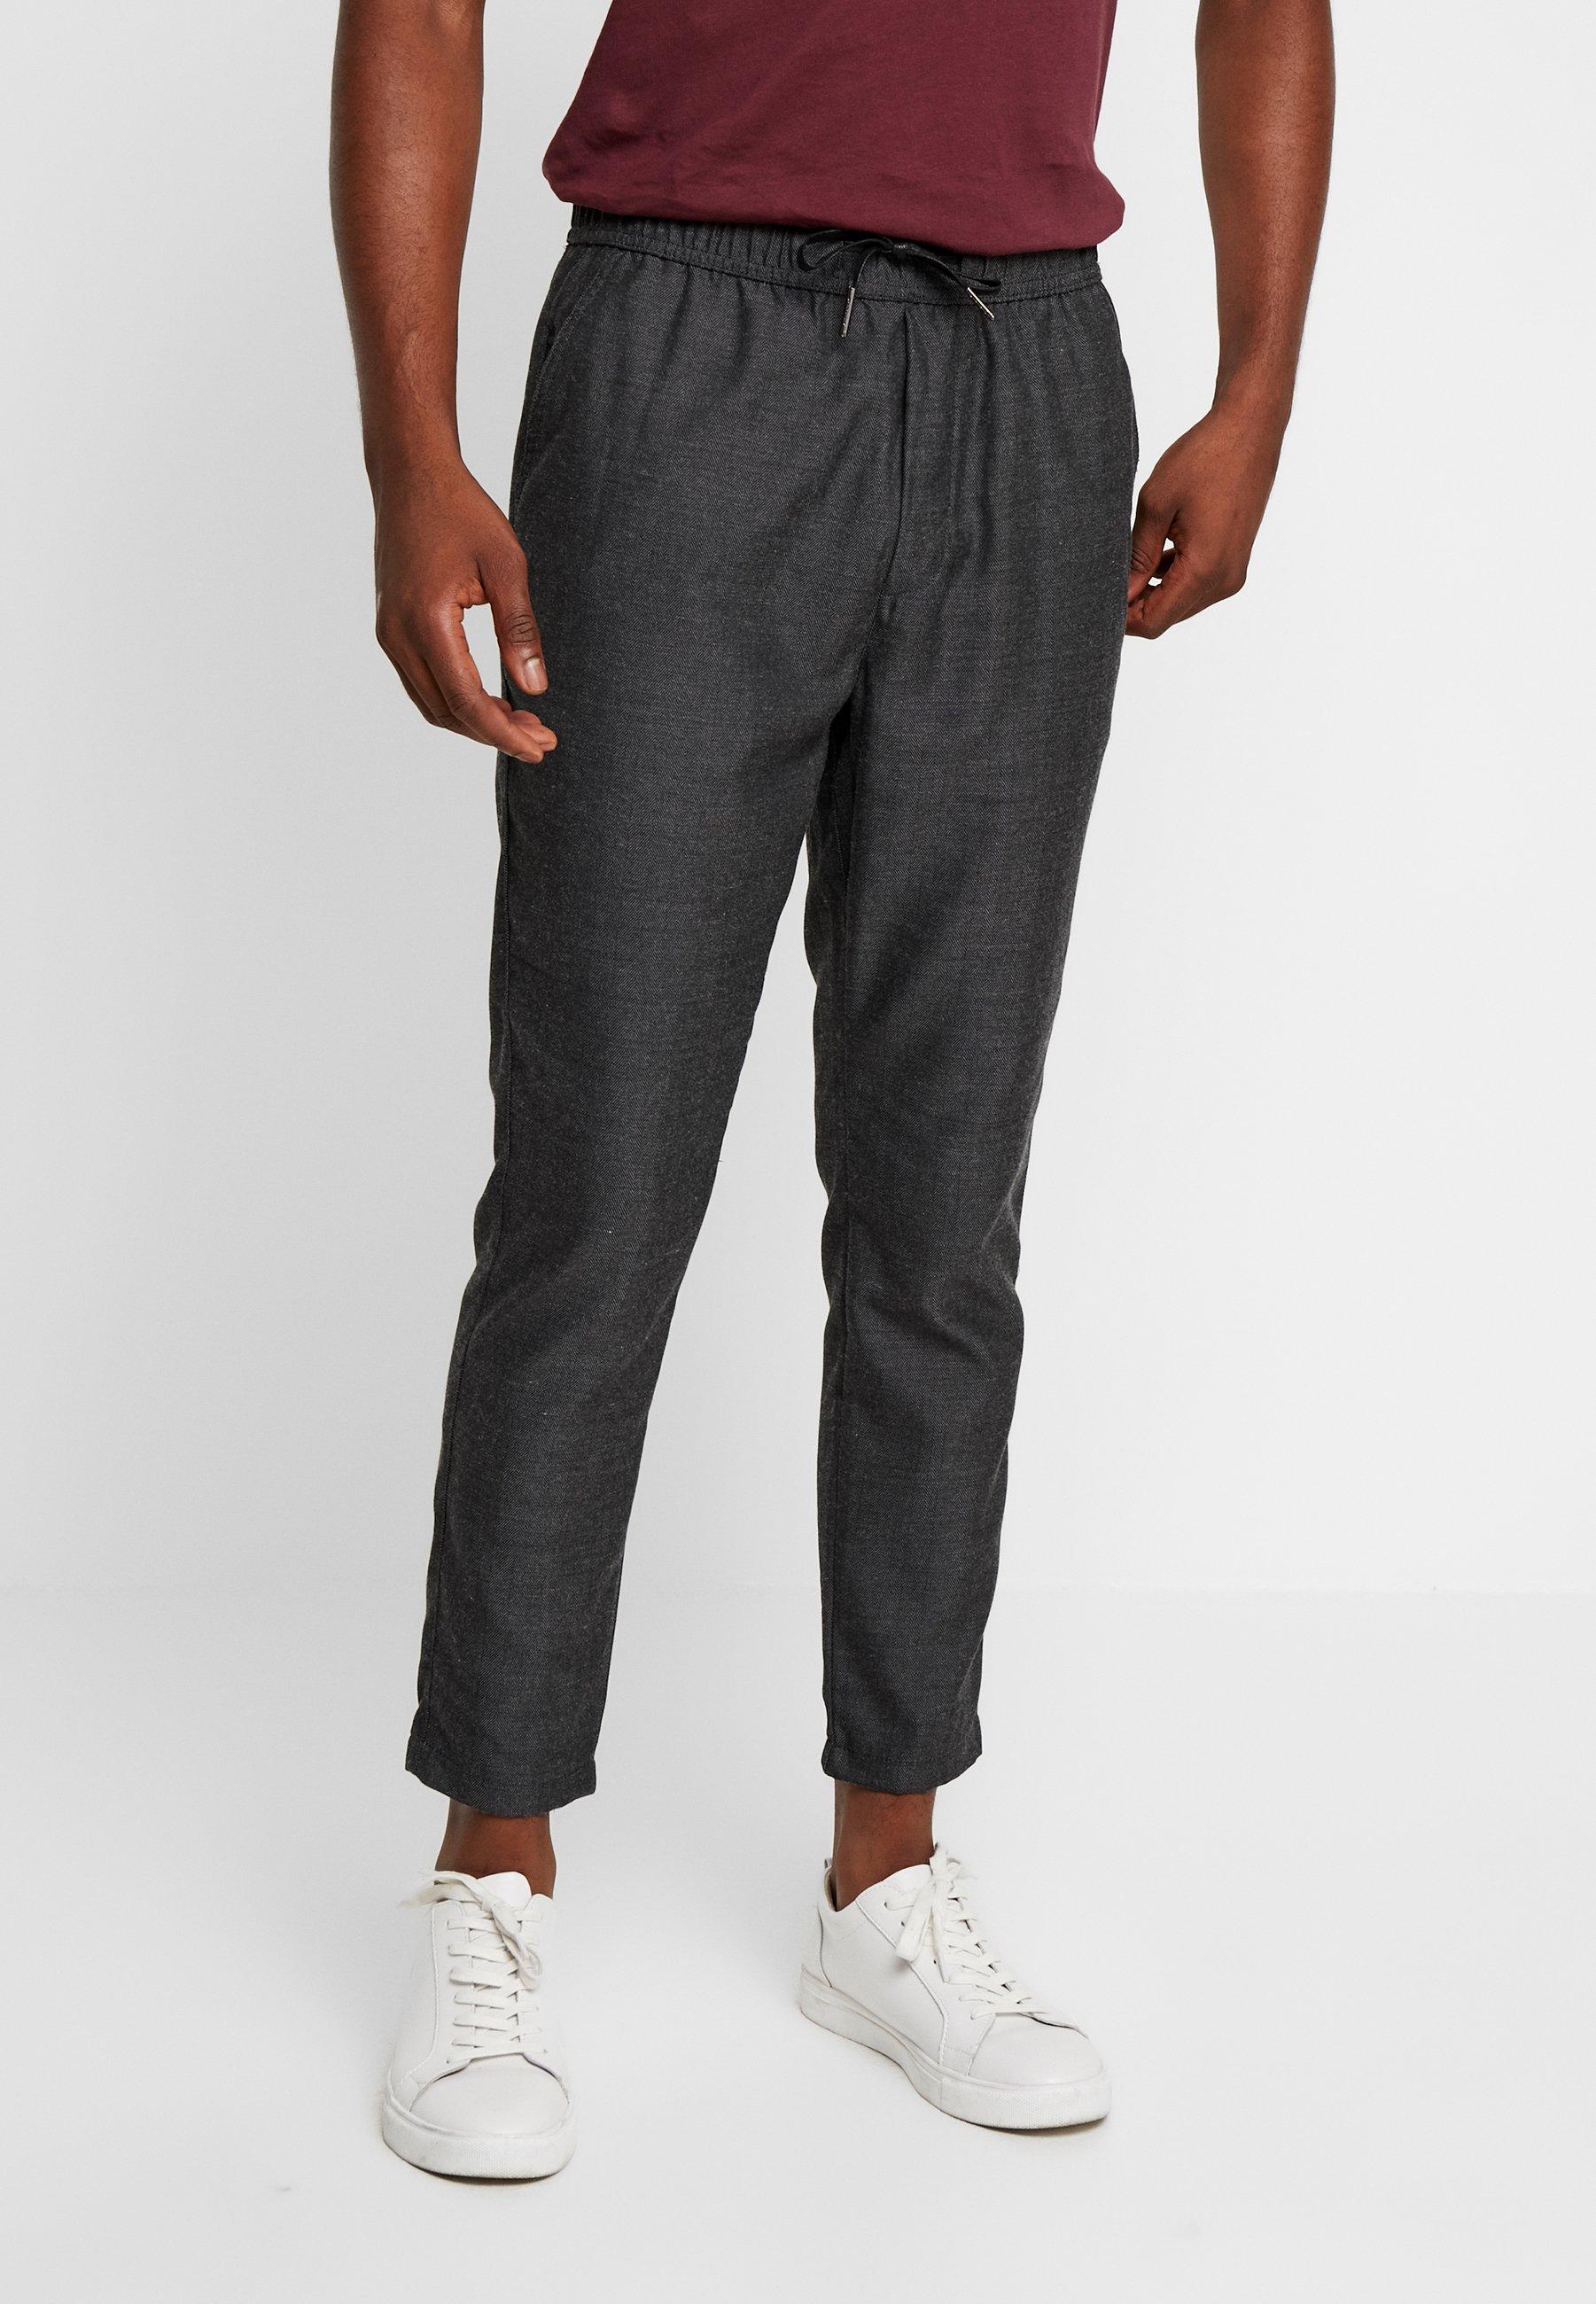 Solid Jogger Trouser - Broek Dark Grey Melange PAxbkOPX hWfggWN2